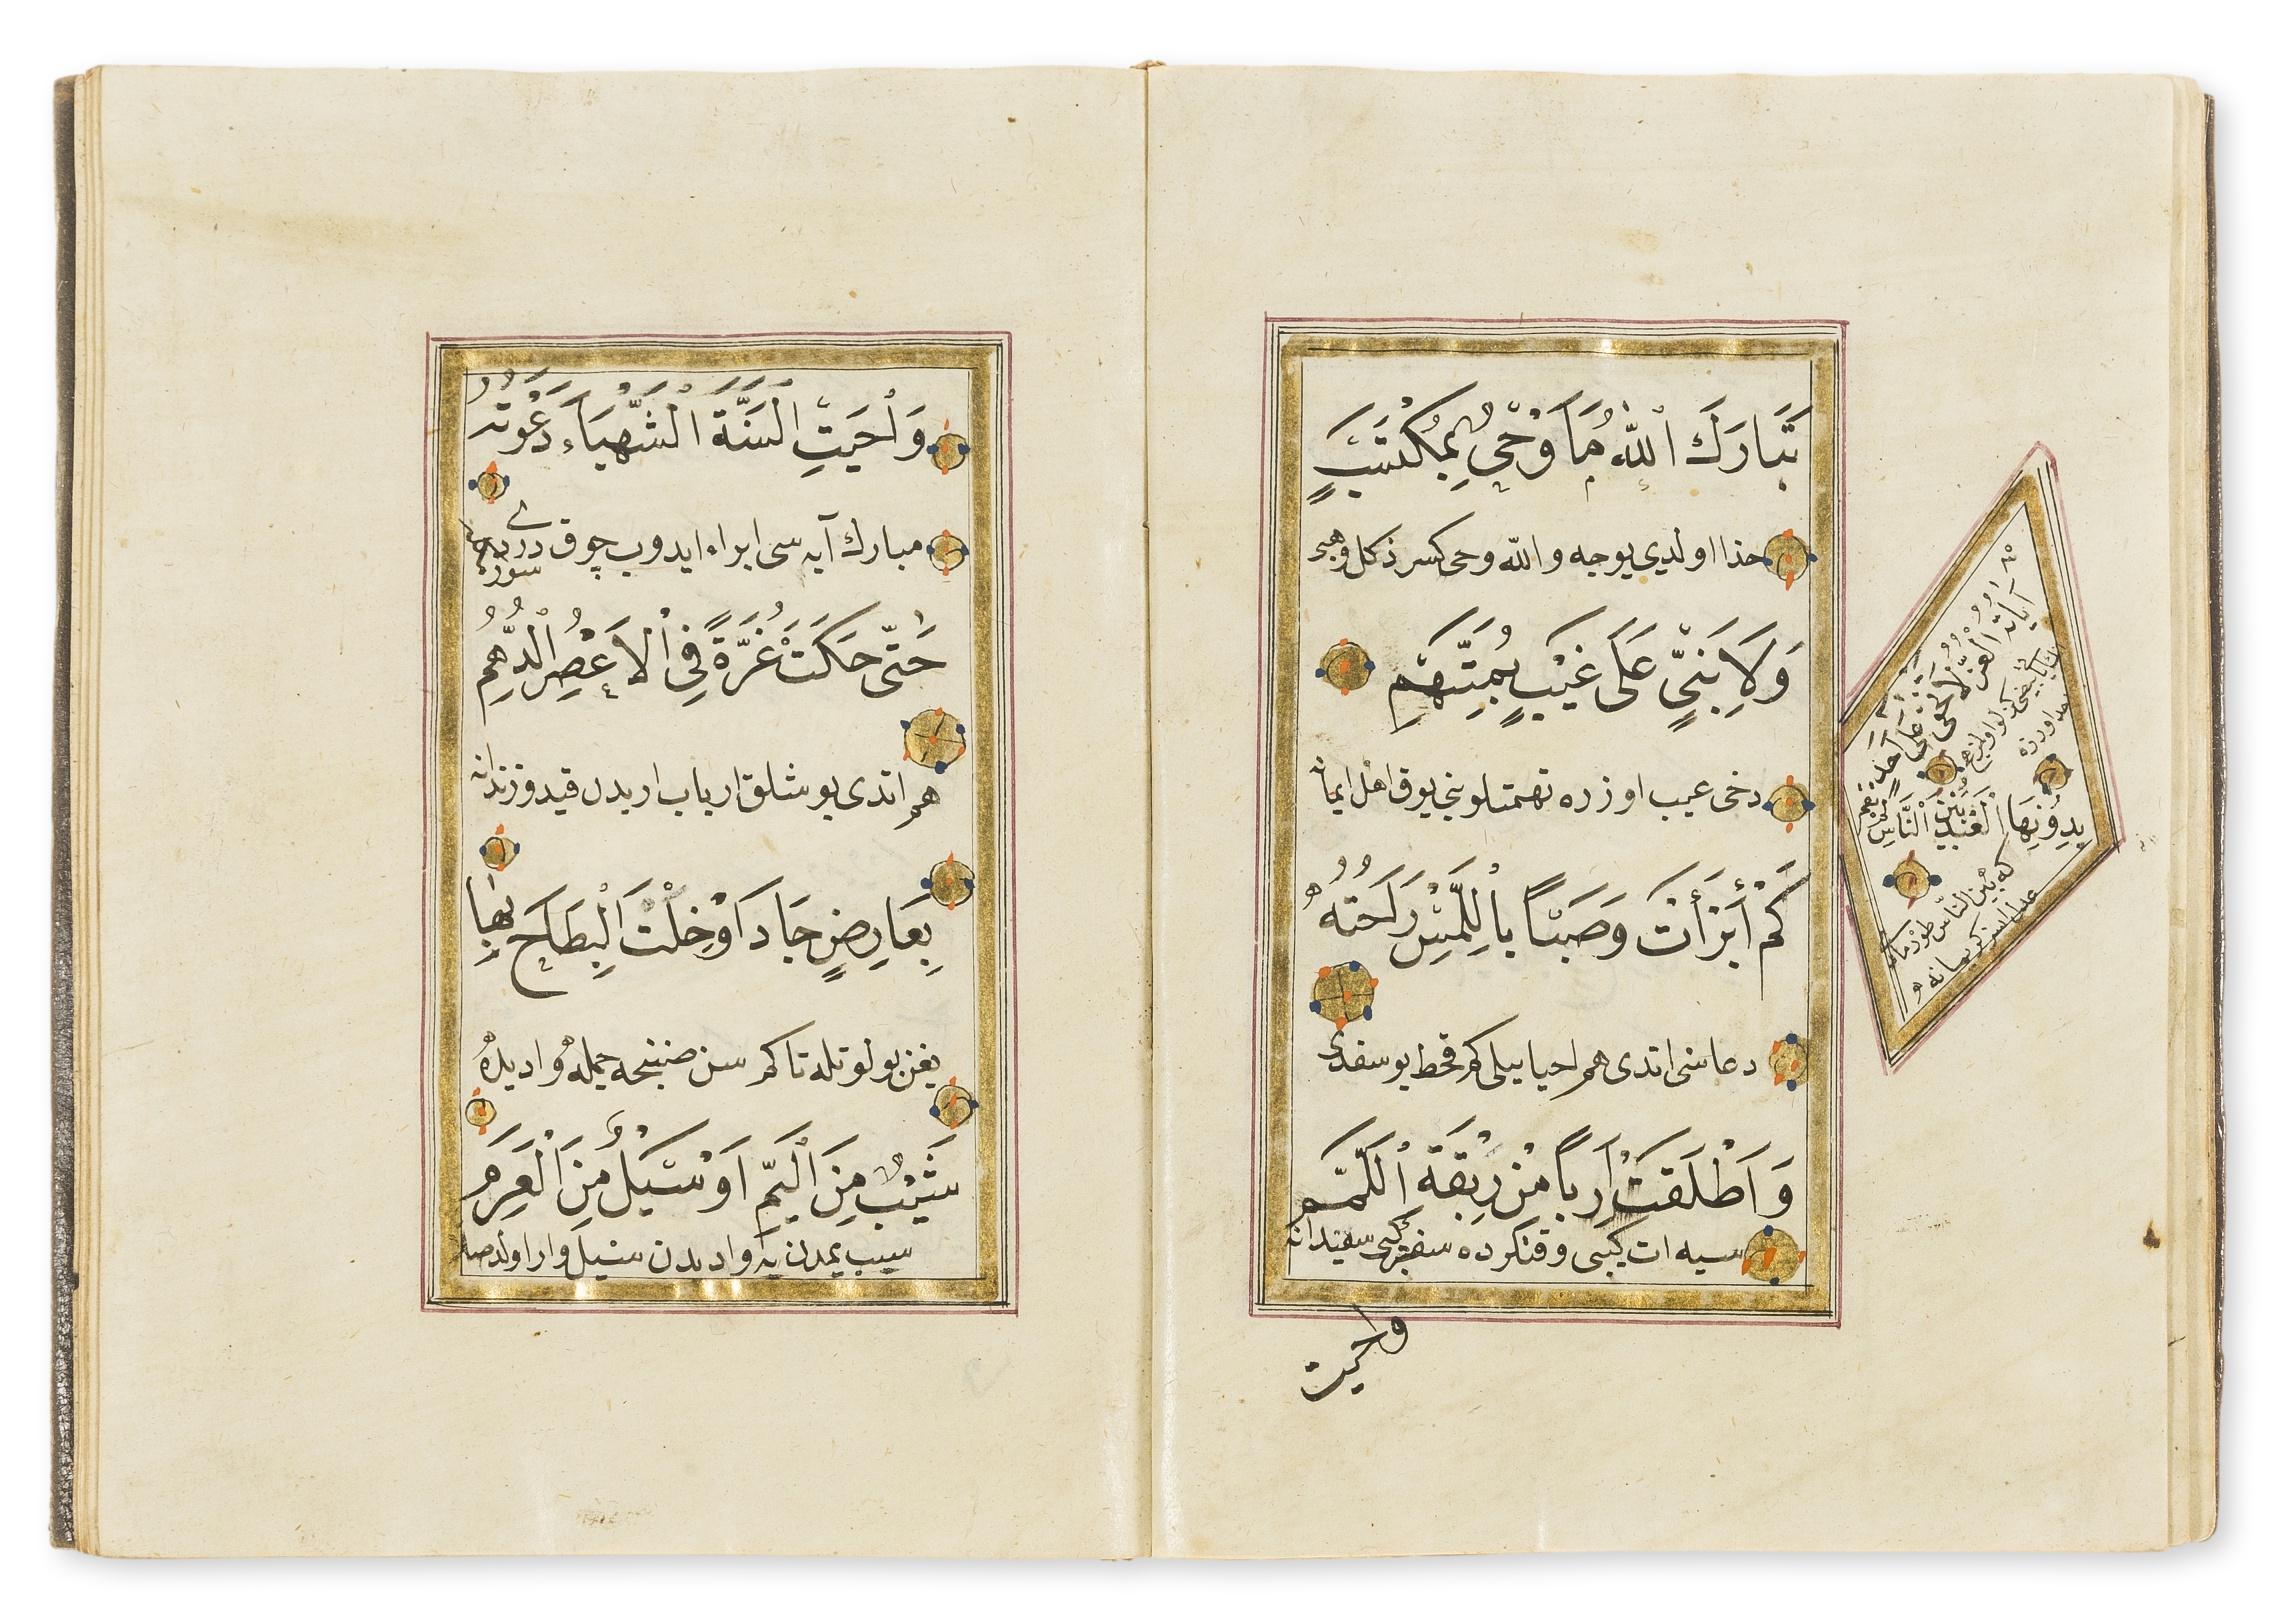 Middle Eastern ms.- Sharaf al-Din Abu 'Abdallah Muhammad bin Sa'id al-Dalasi al-Busiri al-Sanhaji … - Image 2 of 3